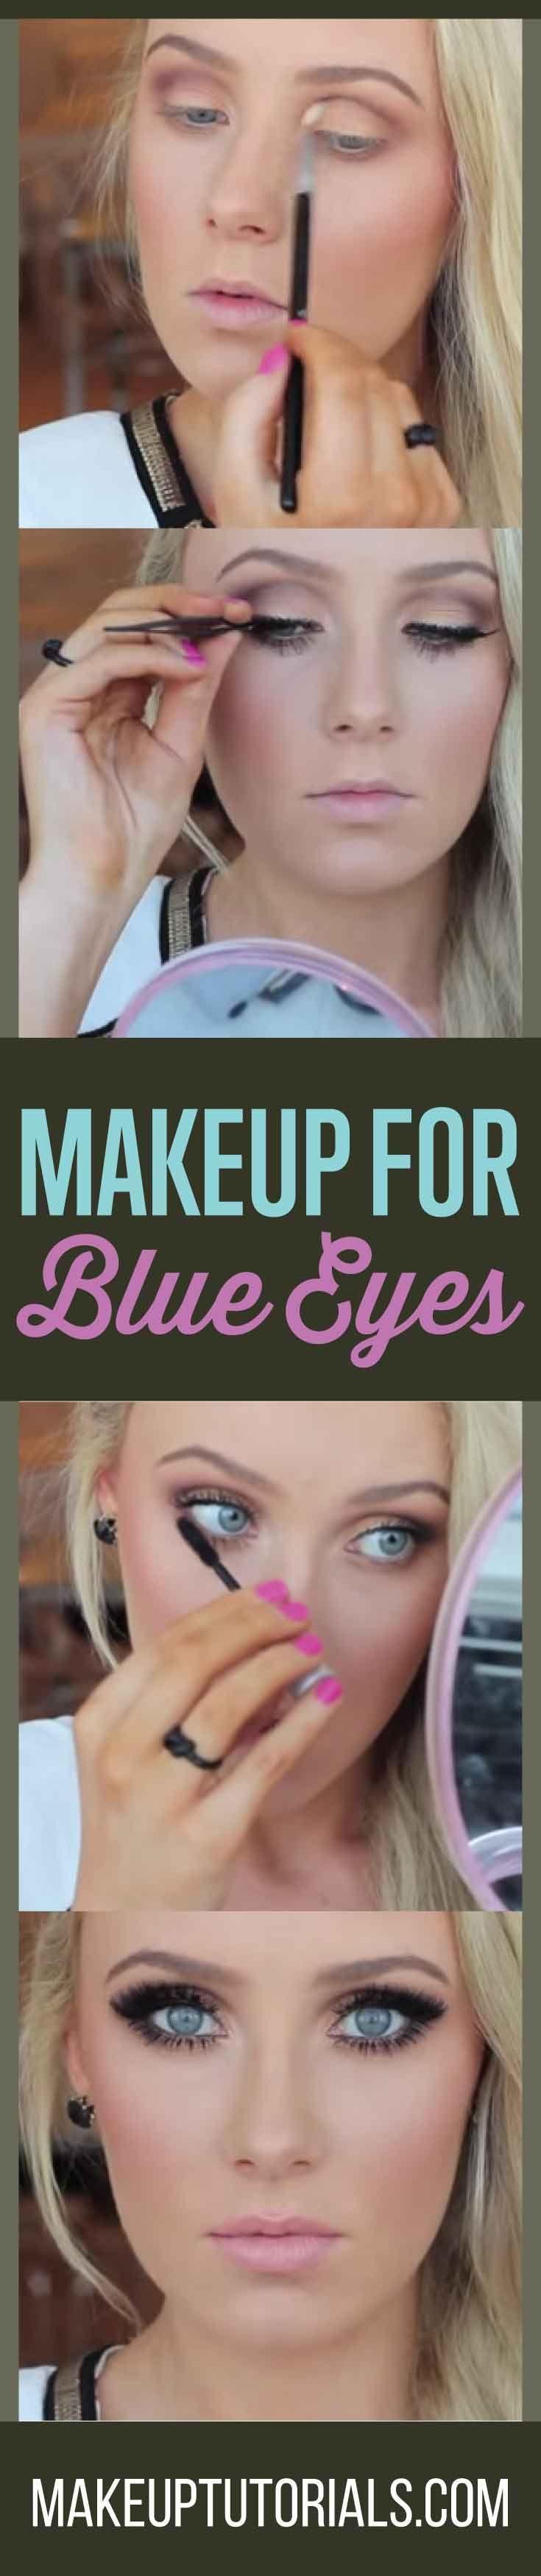 Smokey eye makeup tutorial for blue eyes smokey eye makeup smokey eye makeup tutorial for blue eyes baditri Image collections